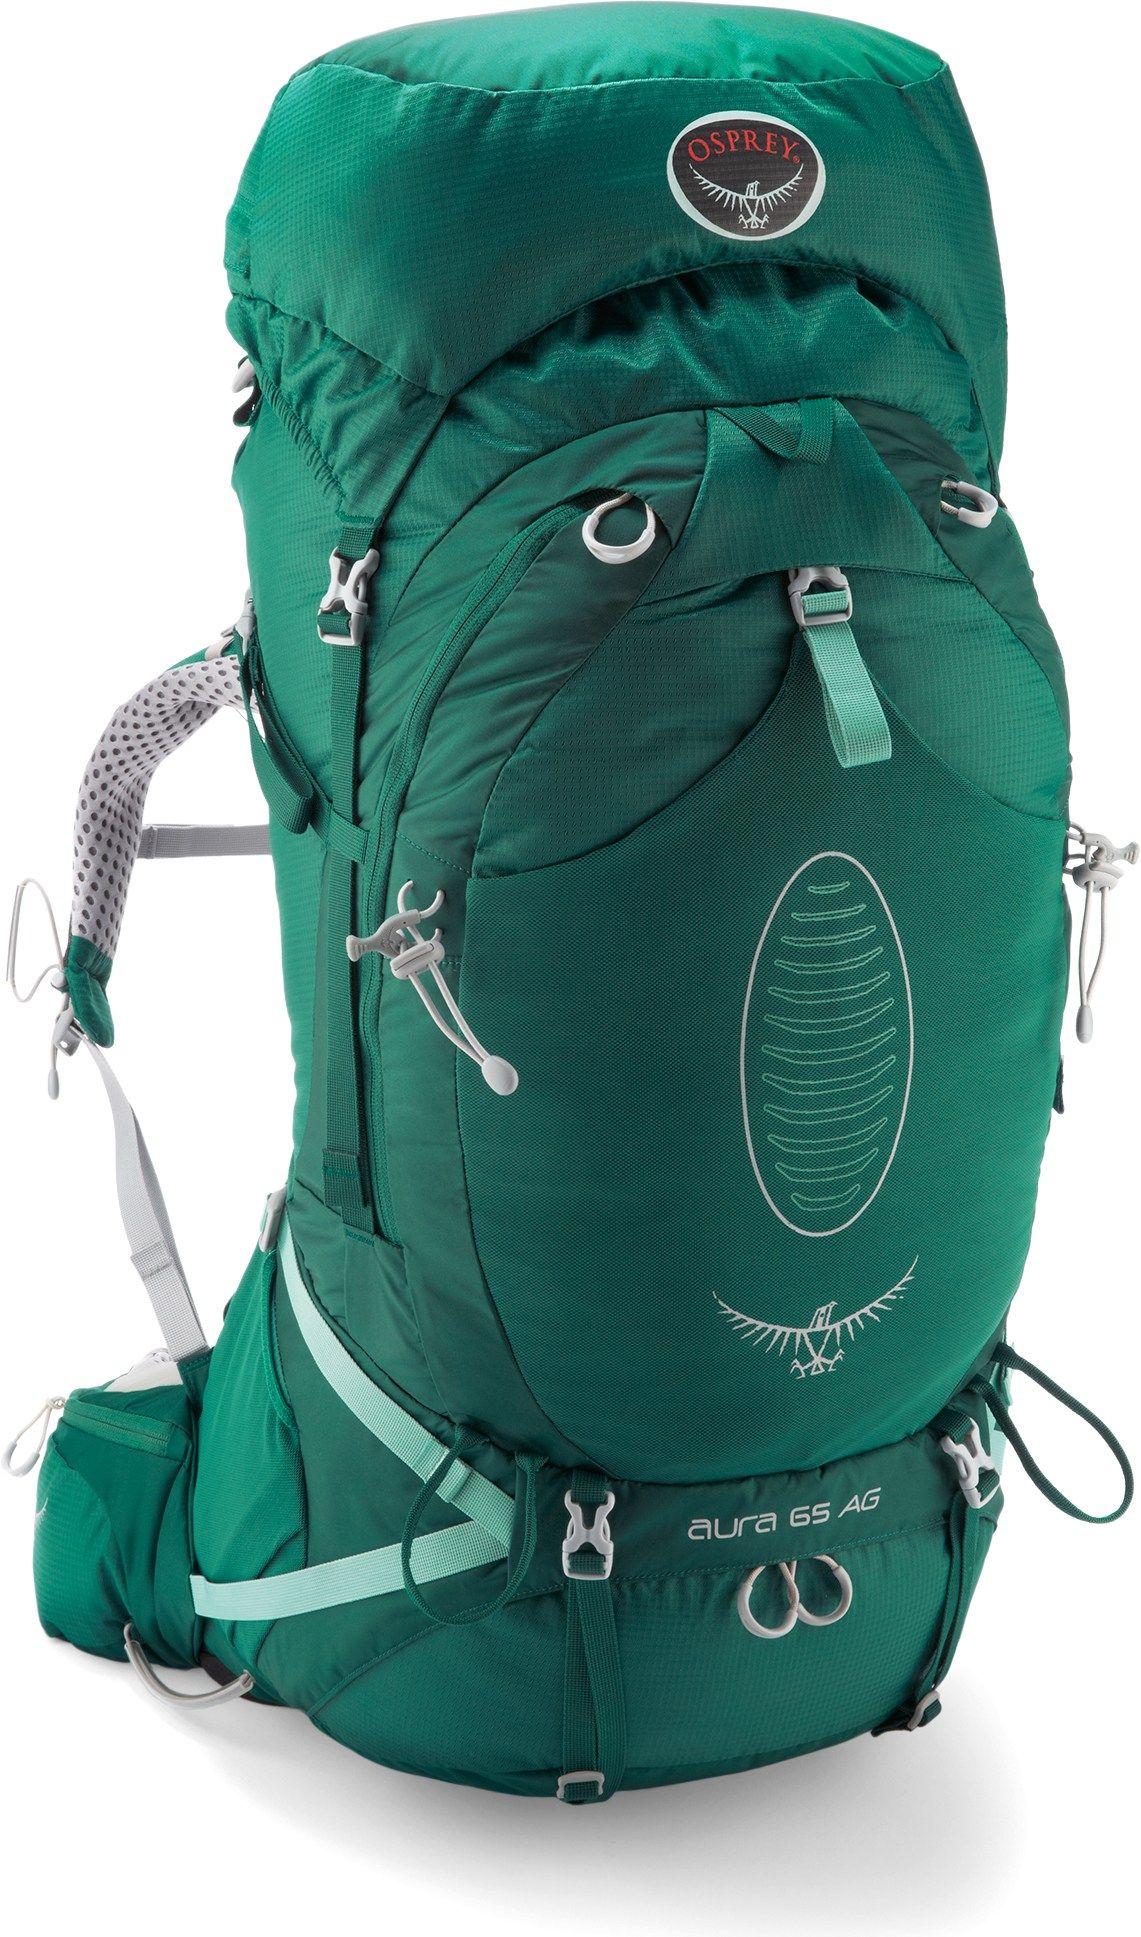 Osprey womens leather gloves - Osprey Women S Aura 65 Ag Ex Pack